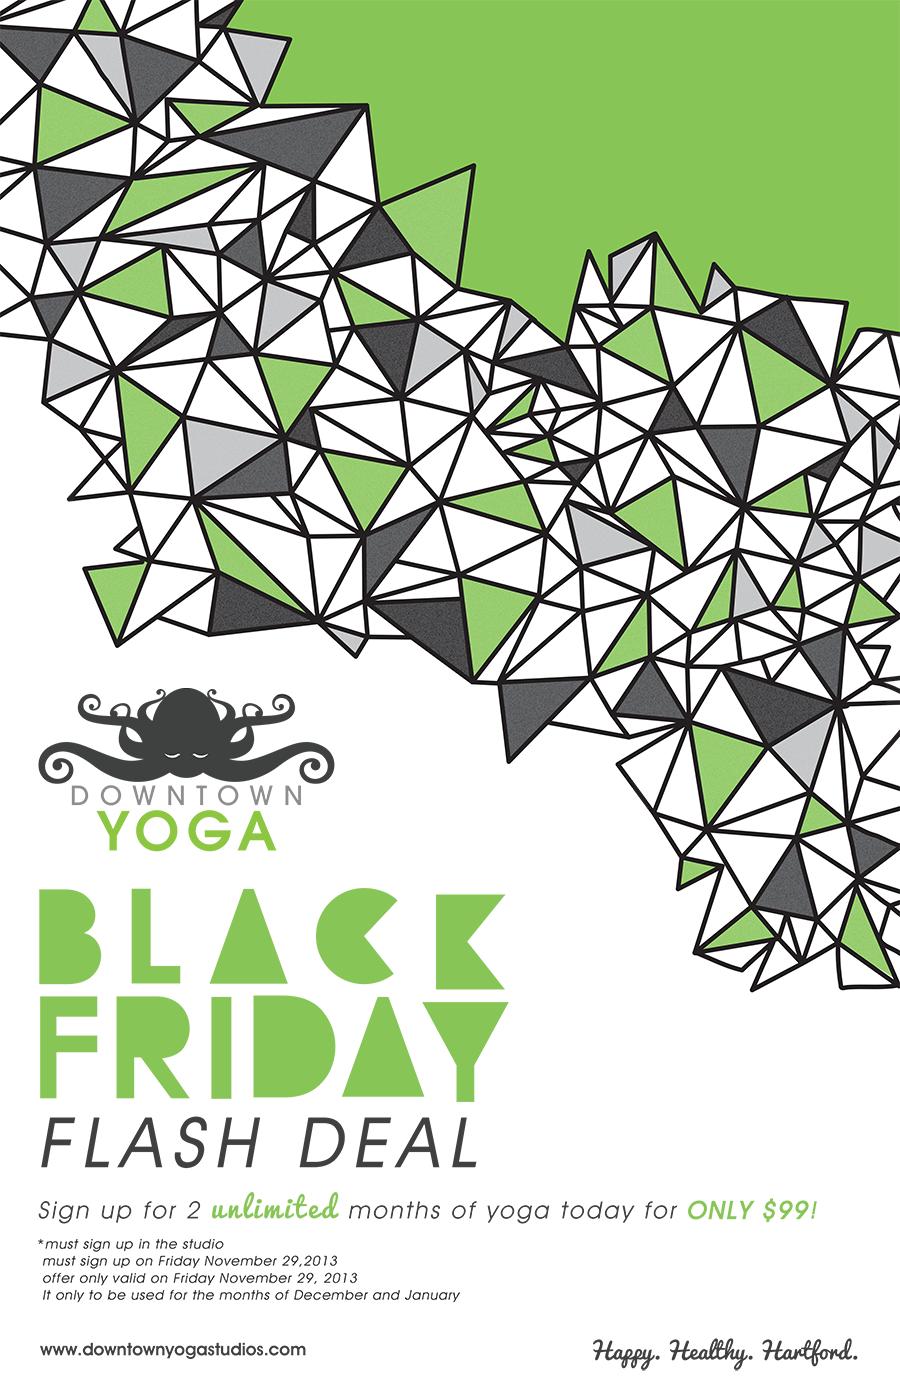 Flash Deal: Black Friday